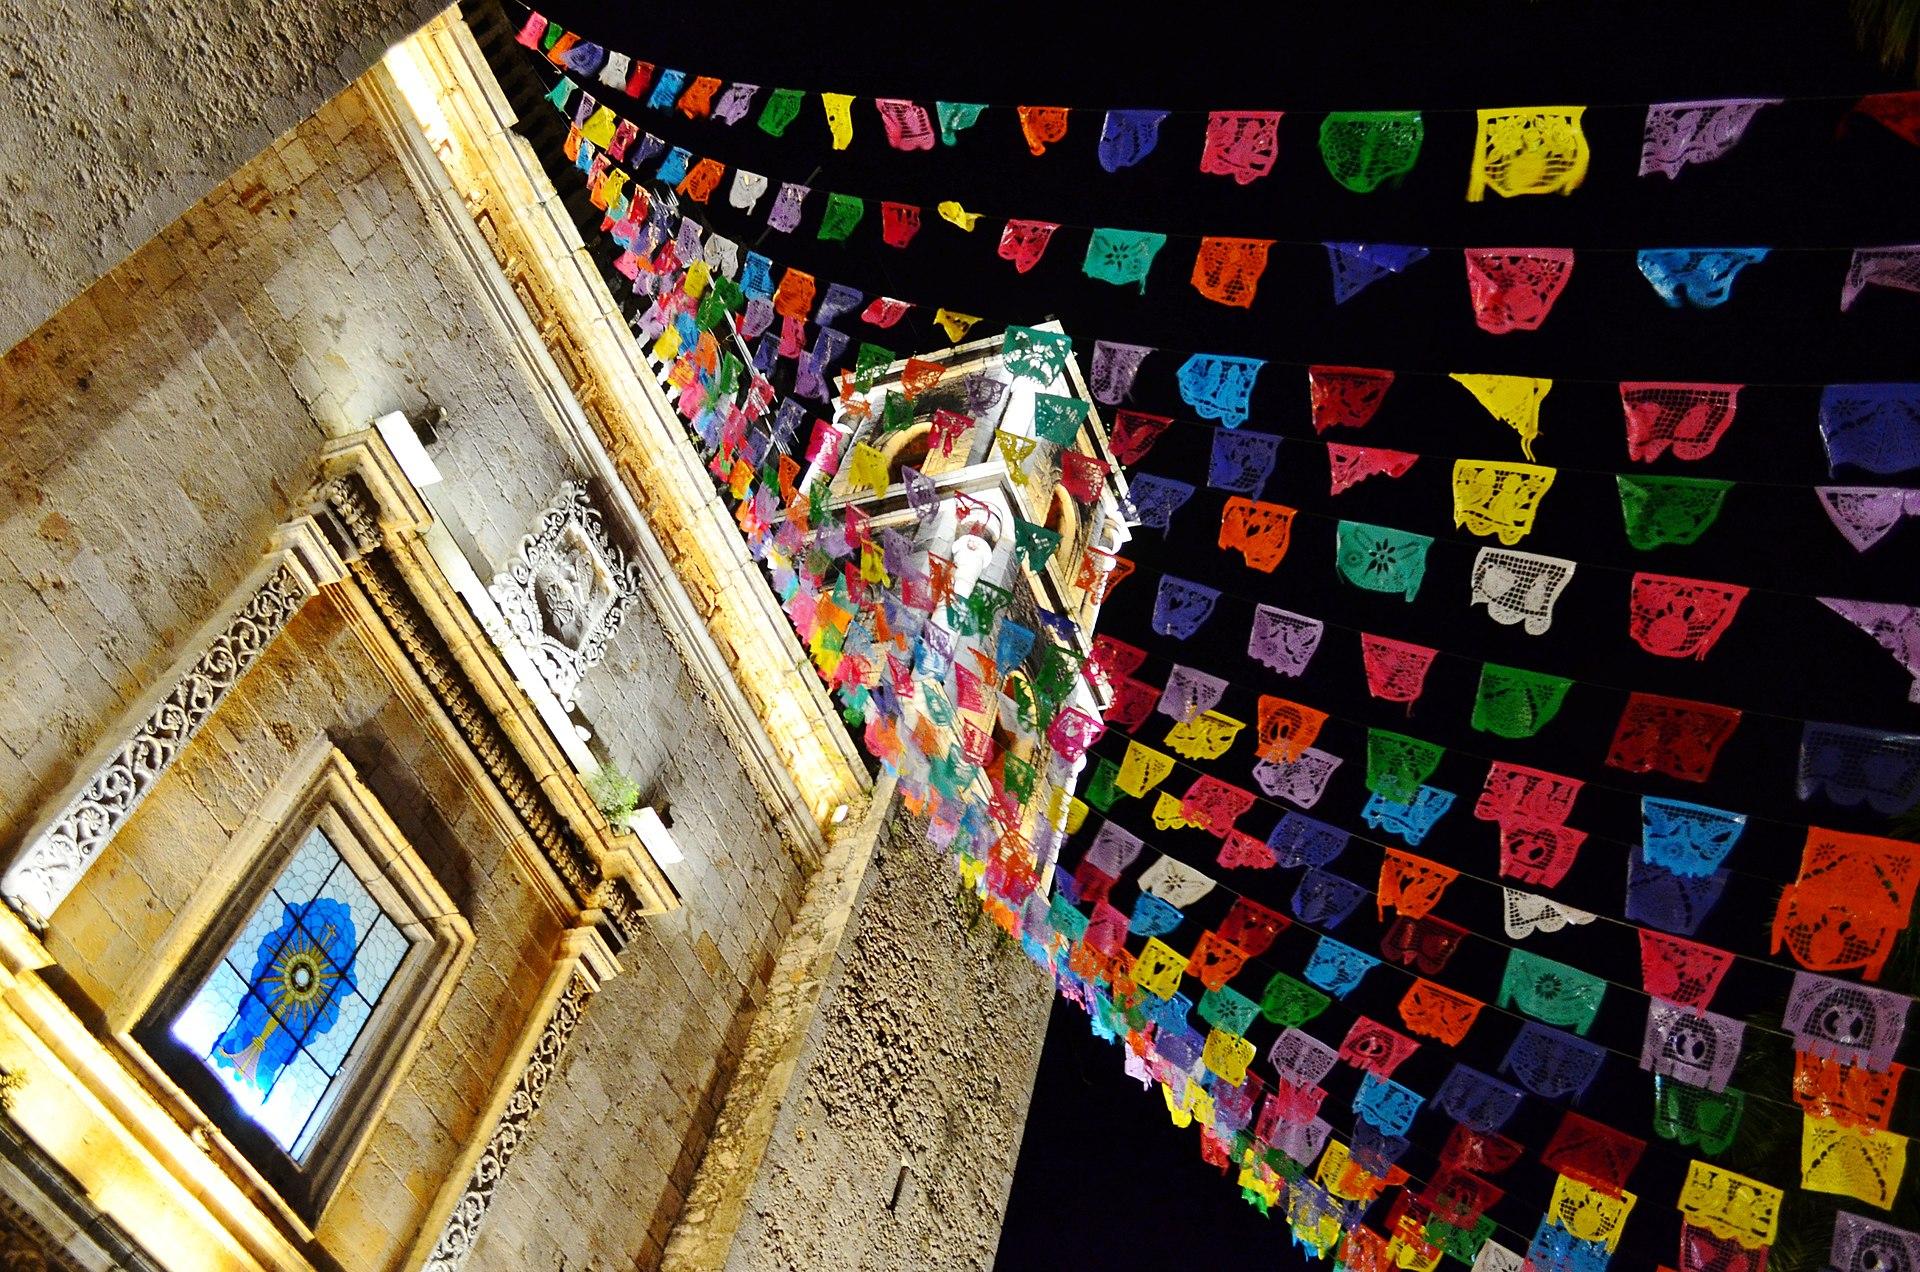 Papel Picado, colorful Mexican bunting